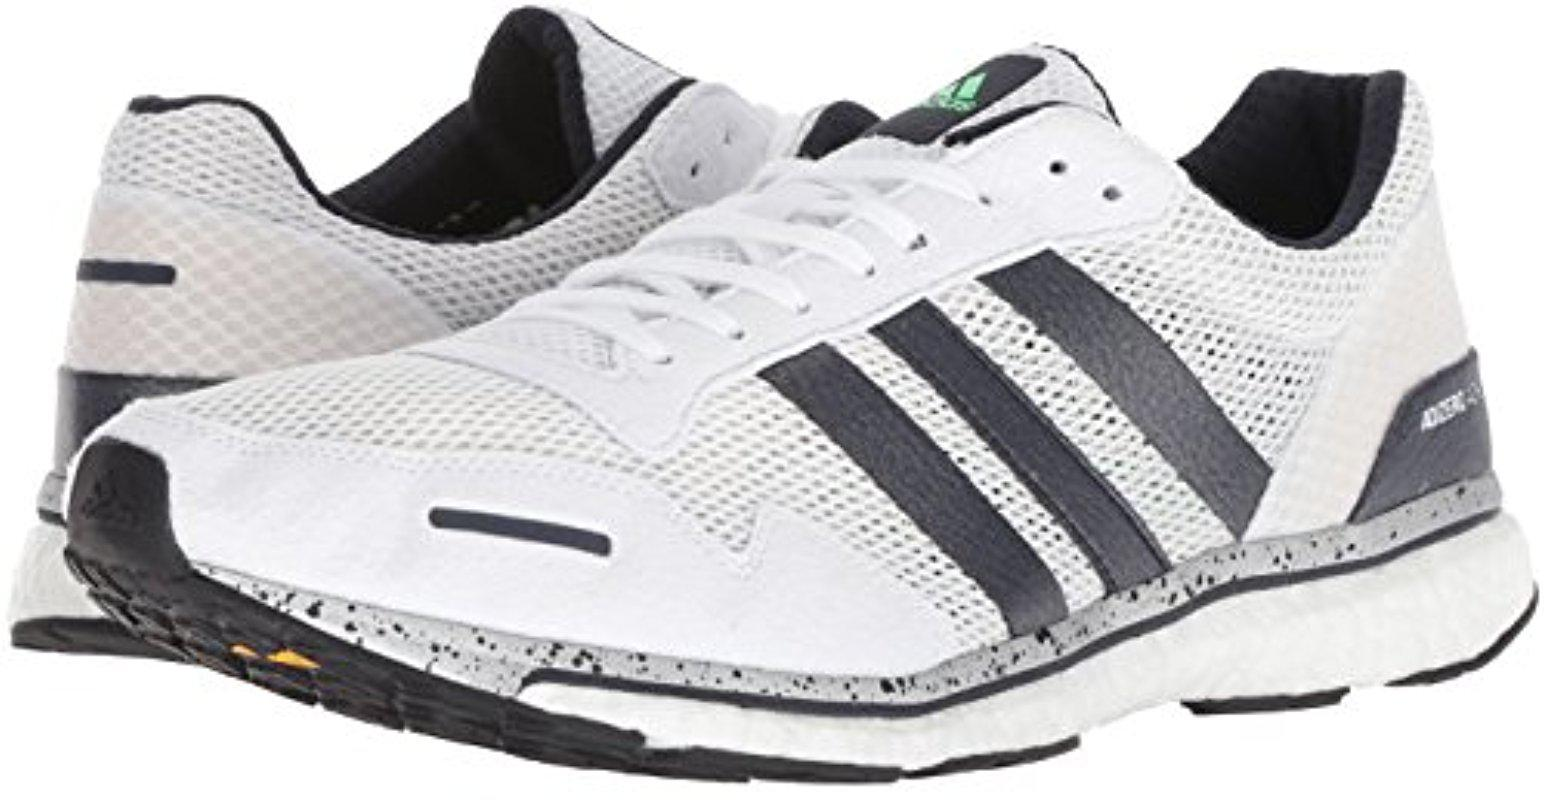 adidas Adizero Adios 3 | Running shoes in 2019 | Adidas